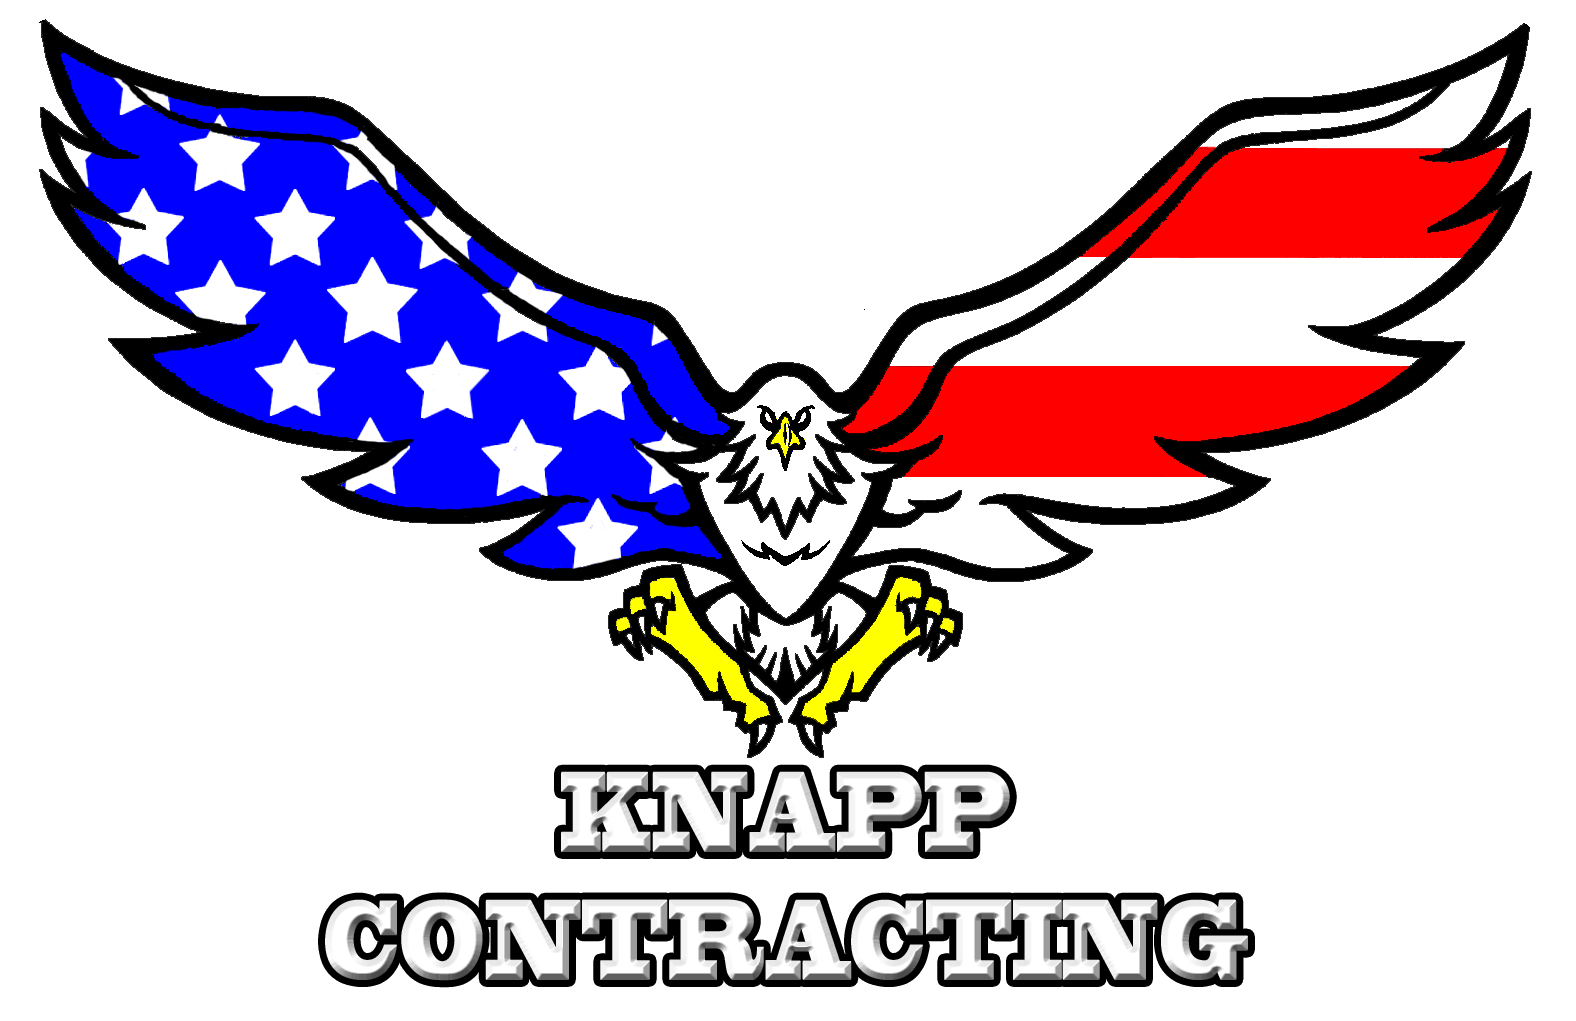 Knapp Contracting.png